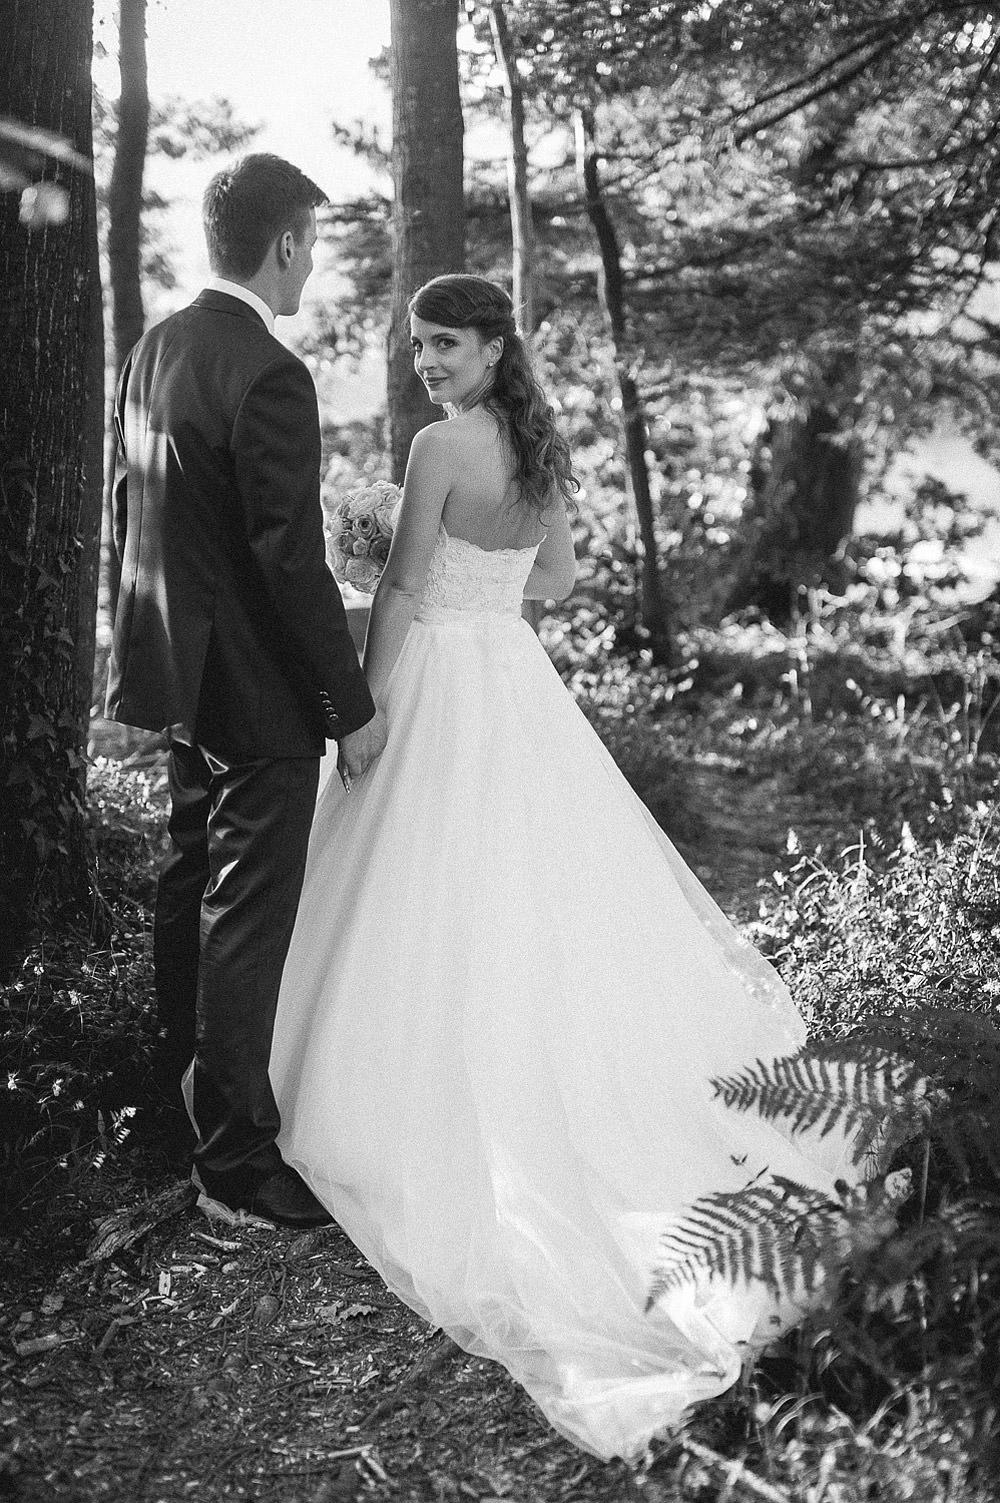 maribor wedding photographer